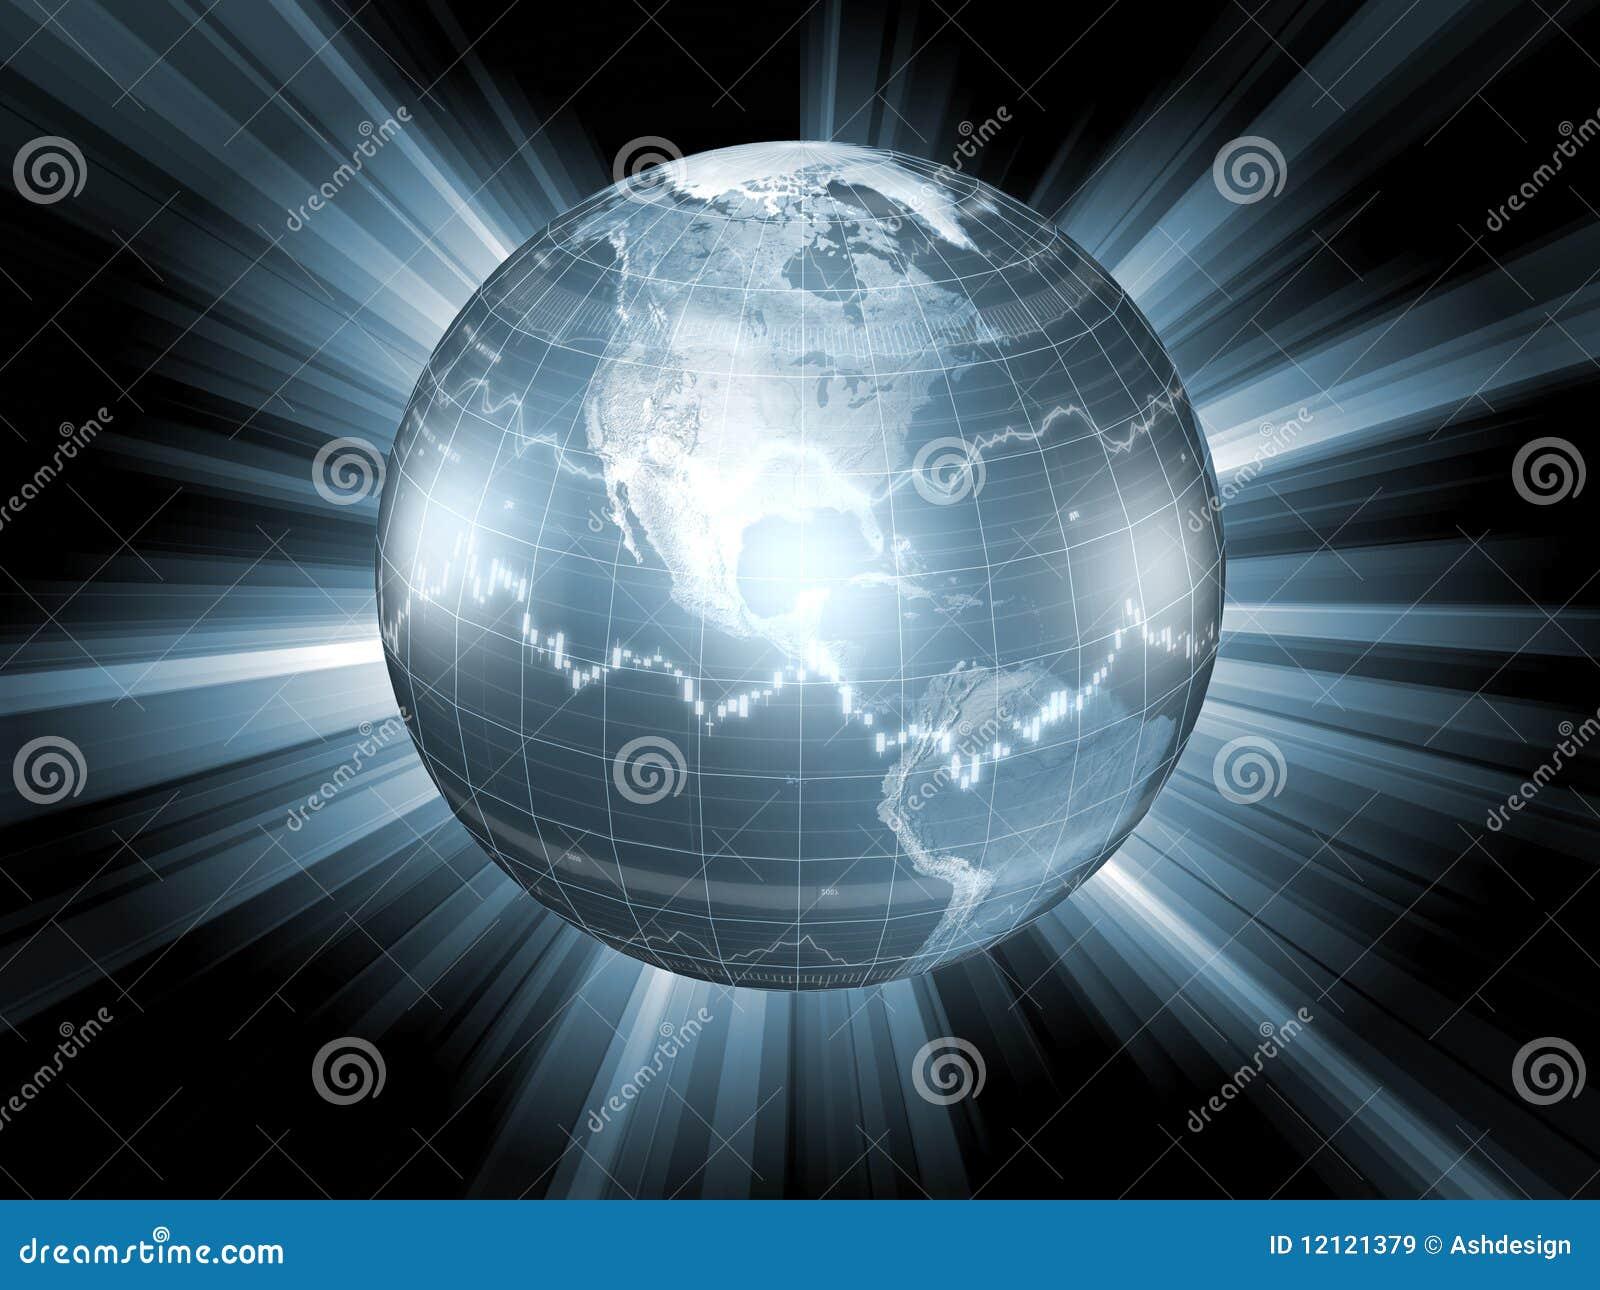 Globe with stock market symbols stock illustration illustration of globe with stock market symbols buycottarizona Gallery